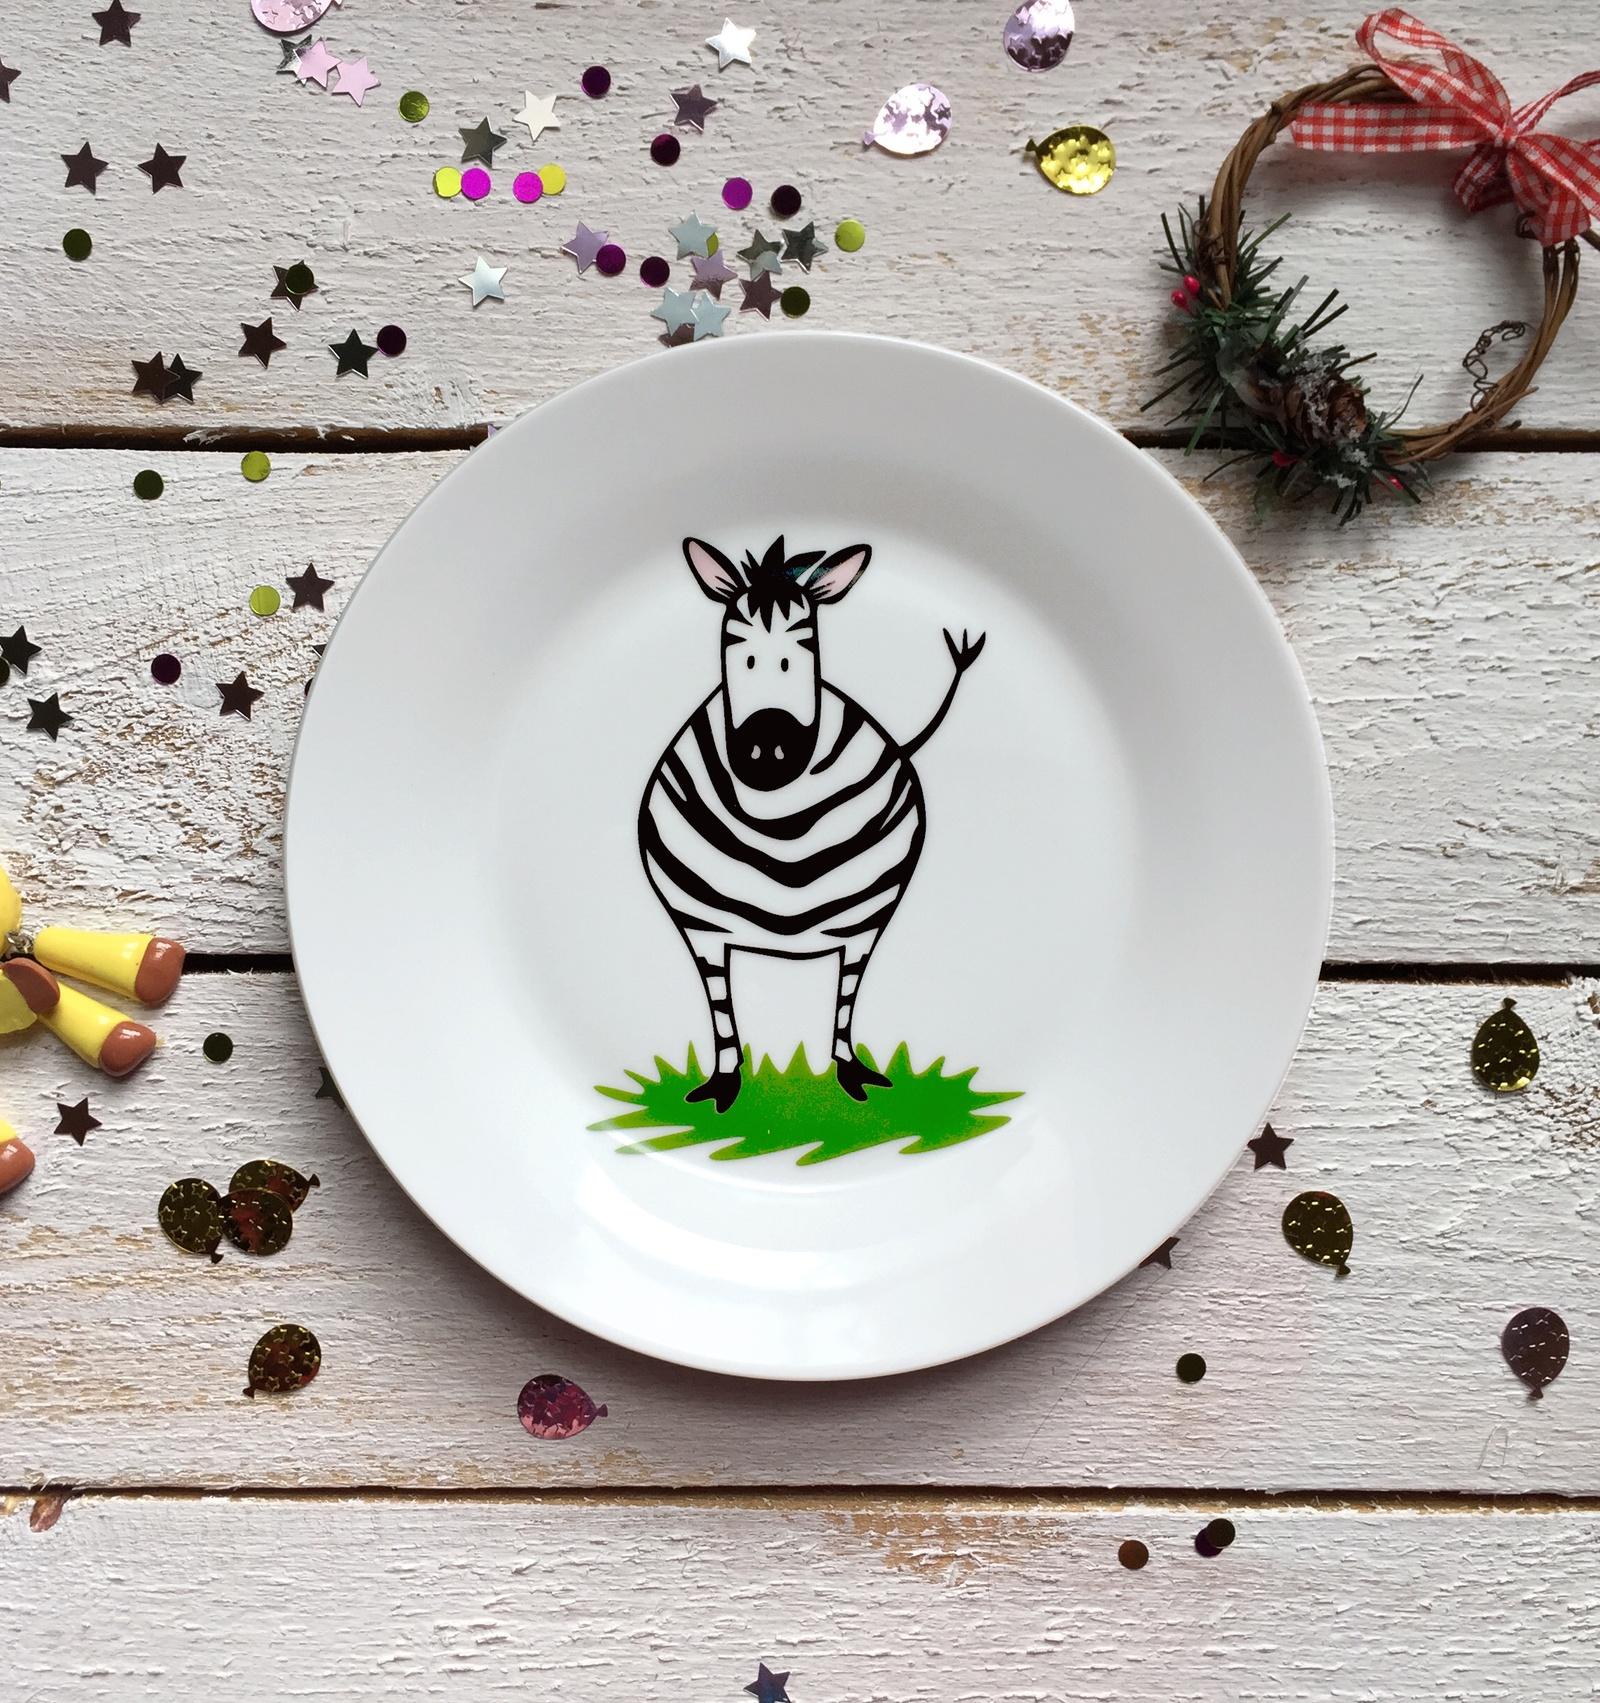 Тарелка Сотвори Чудо Зебрушка 20 см, белый тарелка мелкая сотвори чудо бантик sans brides диаметр 20 см